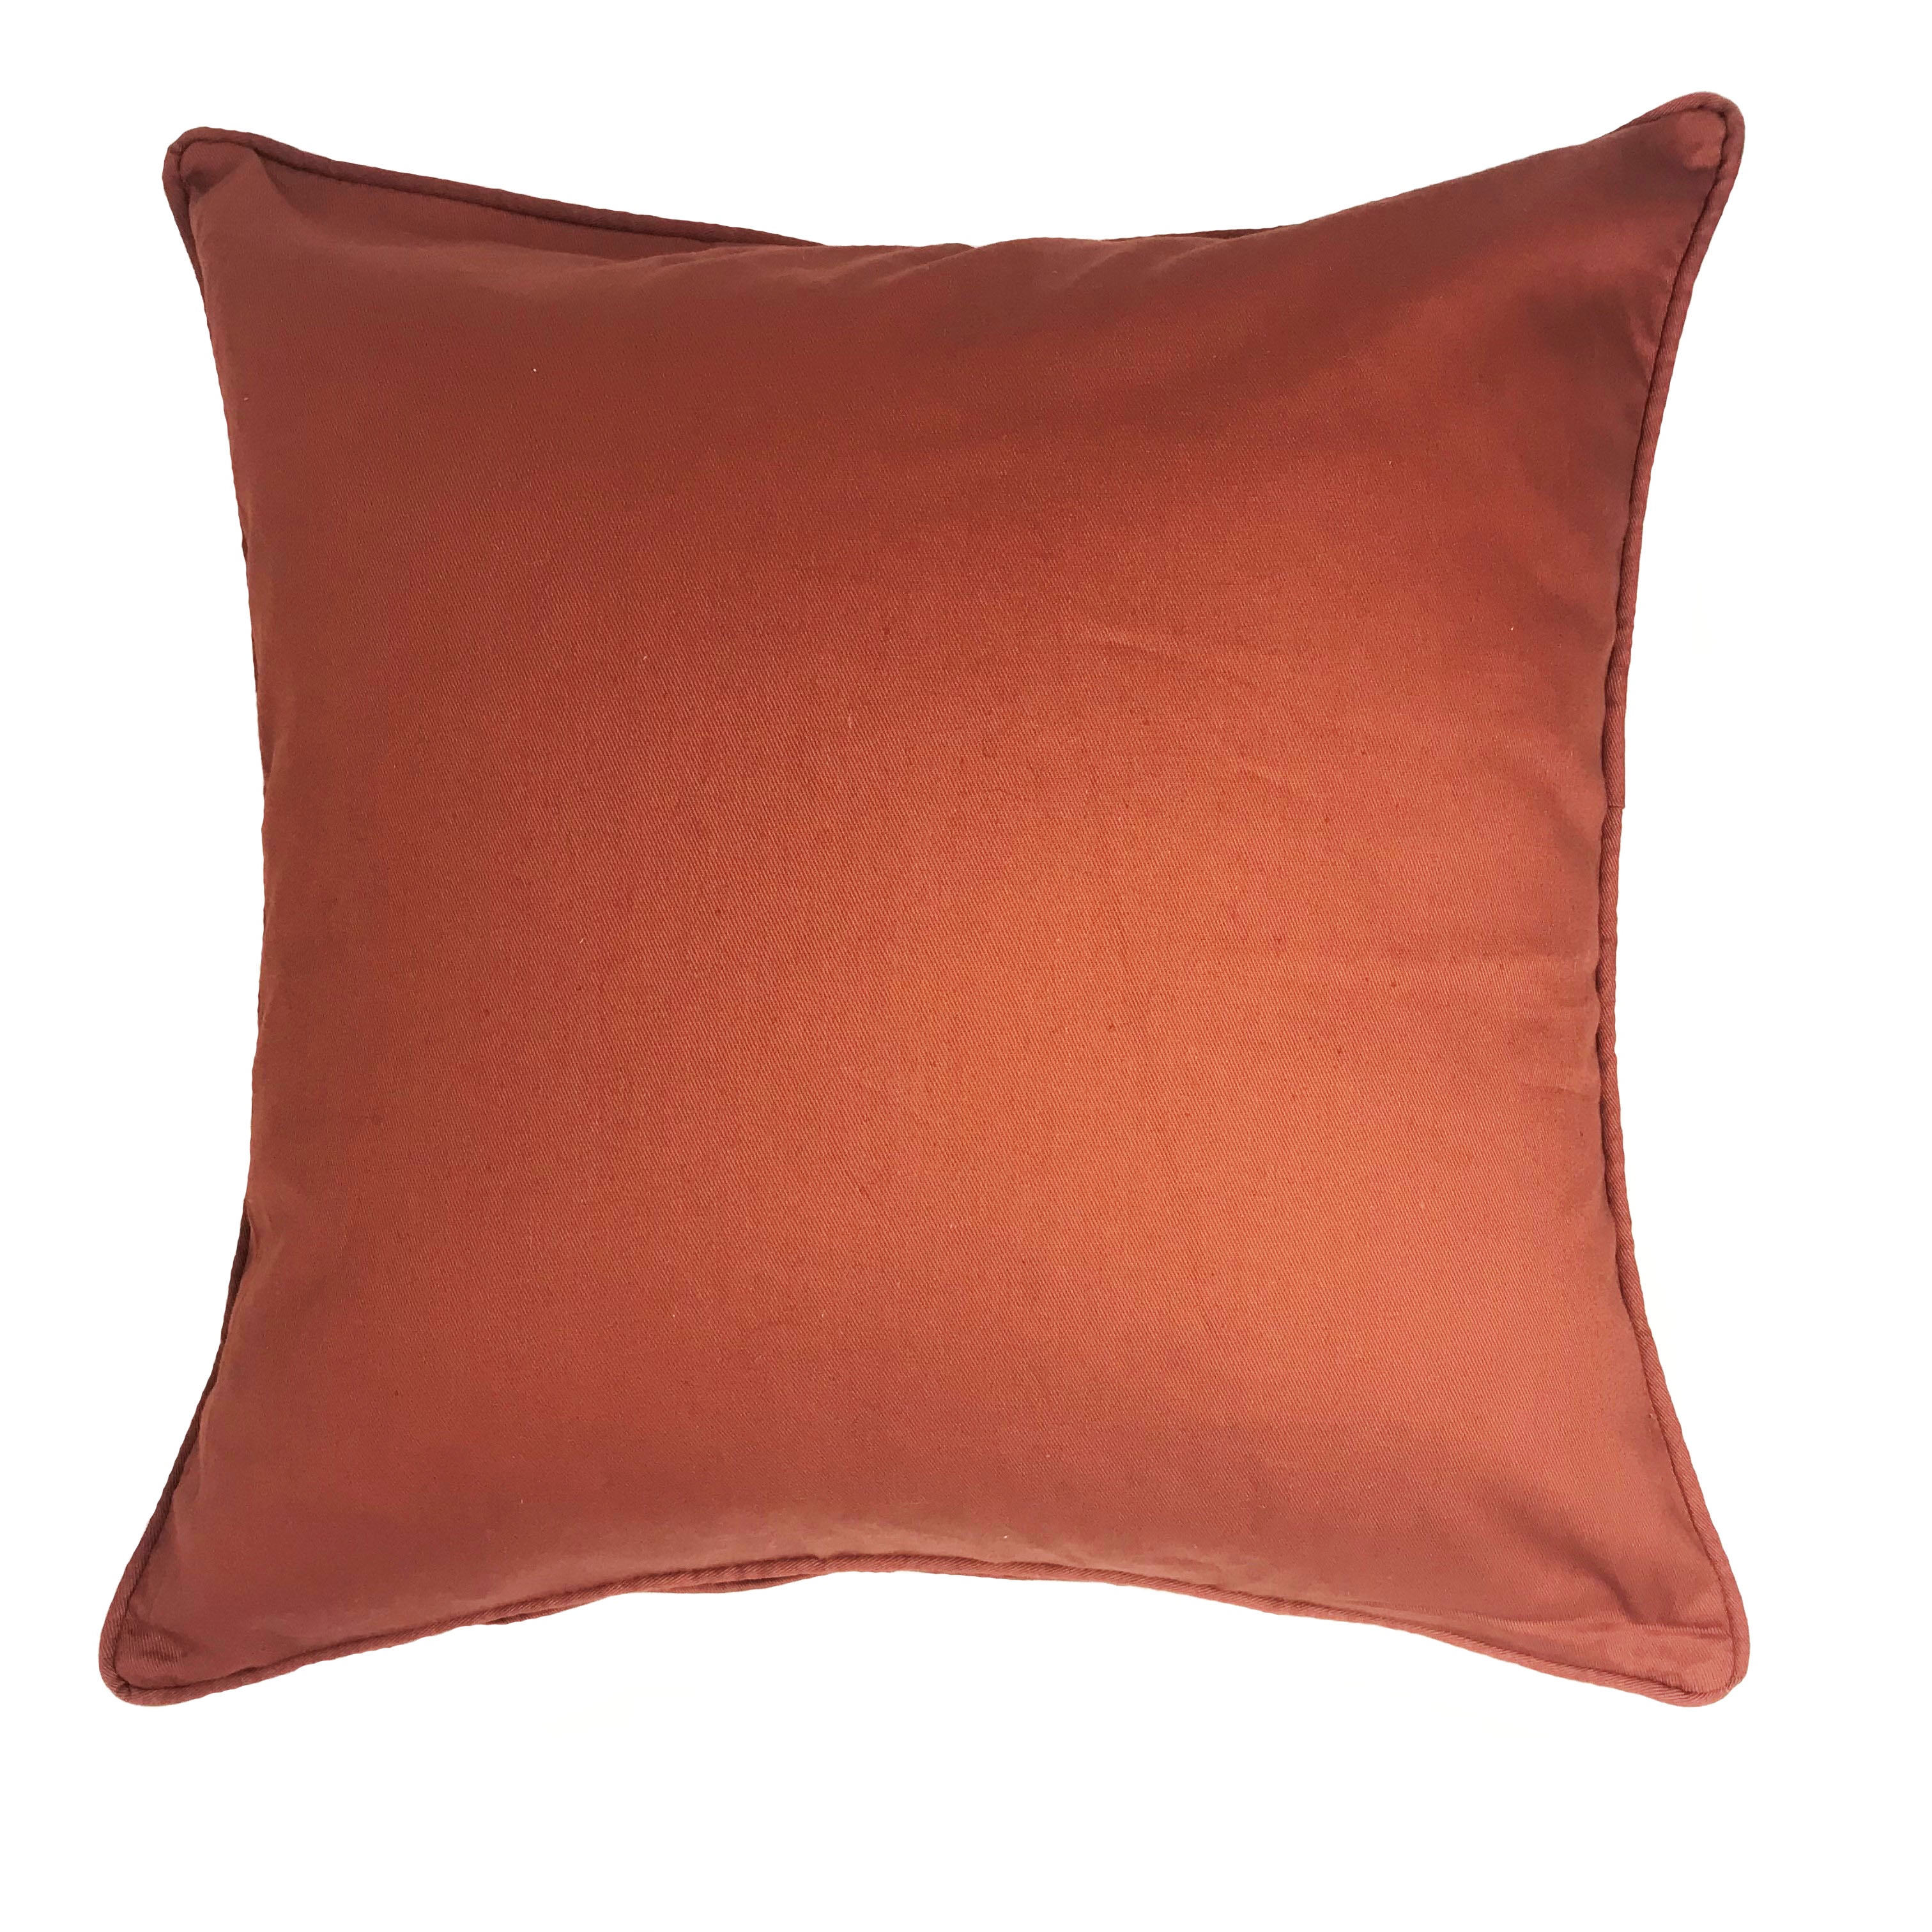 Drill Plain Terracotta 100% Cotton 43cm x 43cm Cushion Cover Only